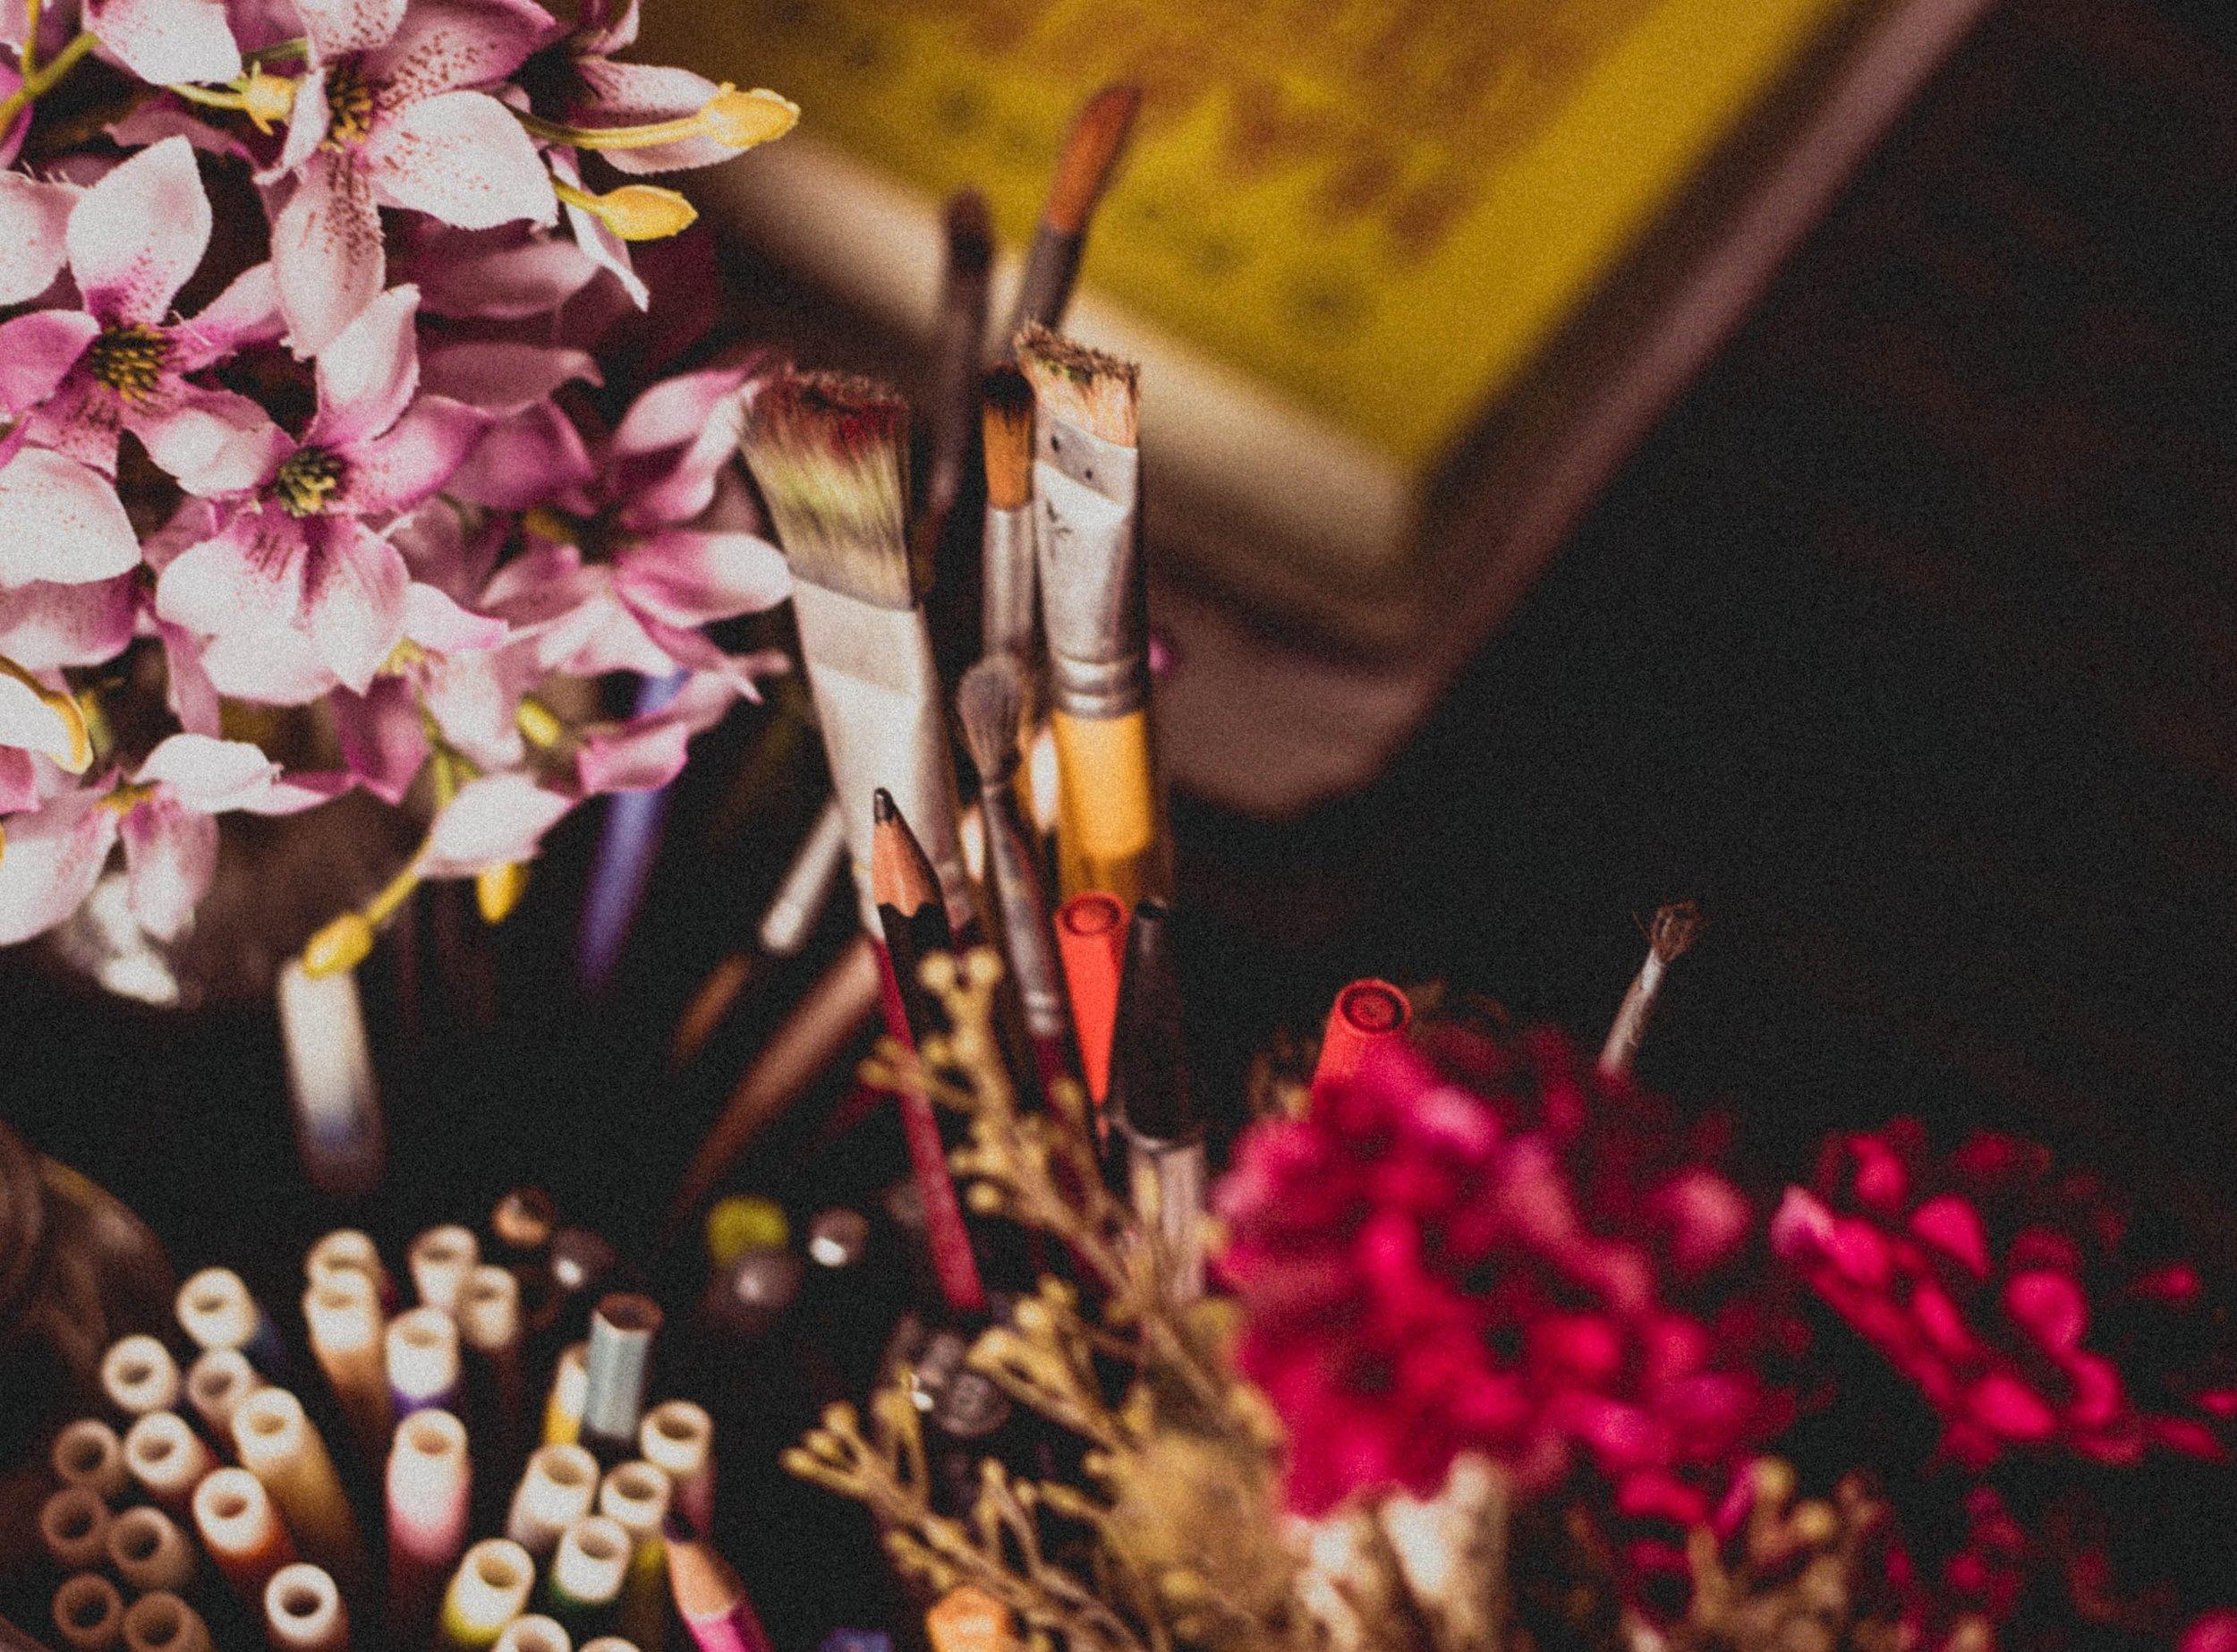 paintbrushes flowers.jpg